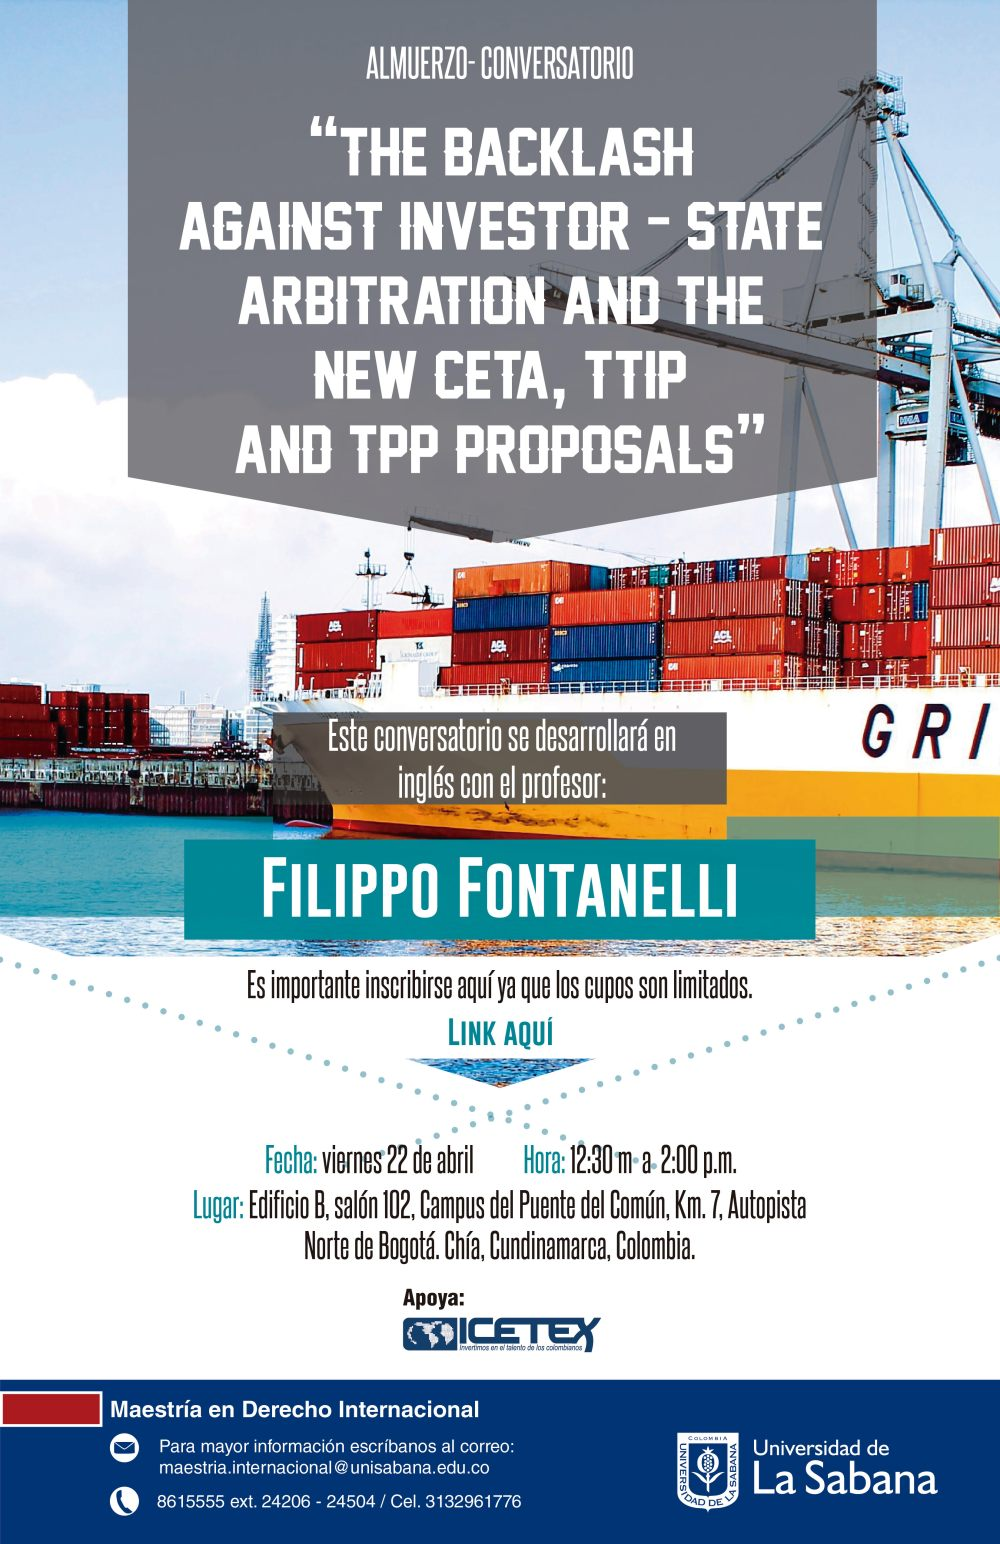 acedi-cilsa-sabana-maestria-conv-backlash-against-investor-state-arbitration